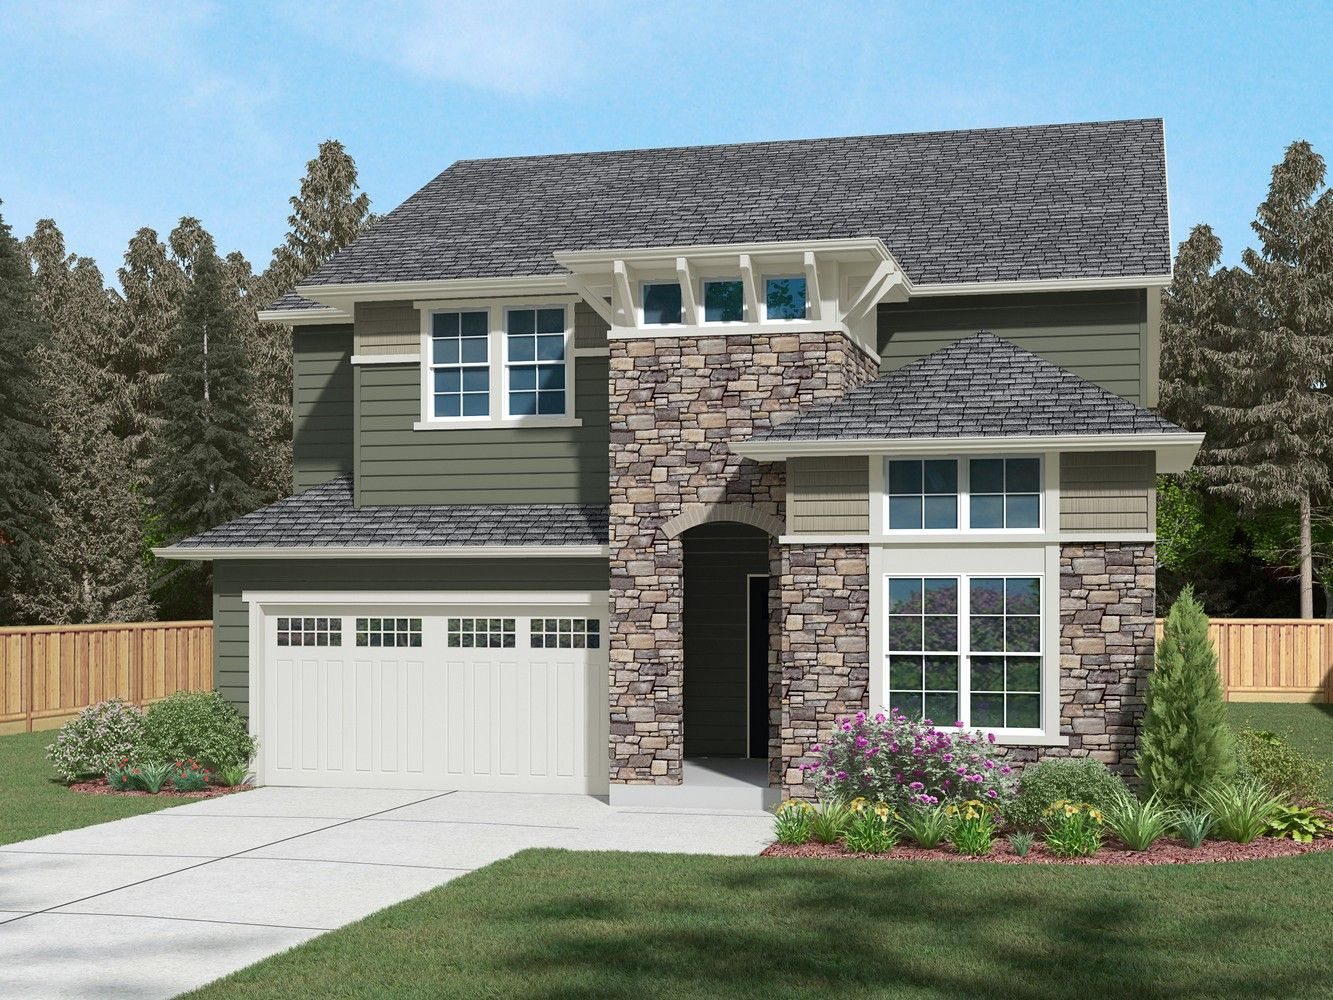 Single Family for Sale at English Landing - Residence H-390 12180 173rd Place Ne Redmond, Washington 98052 United States